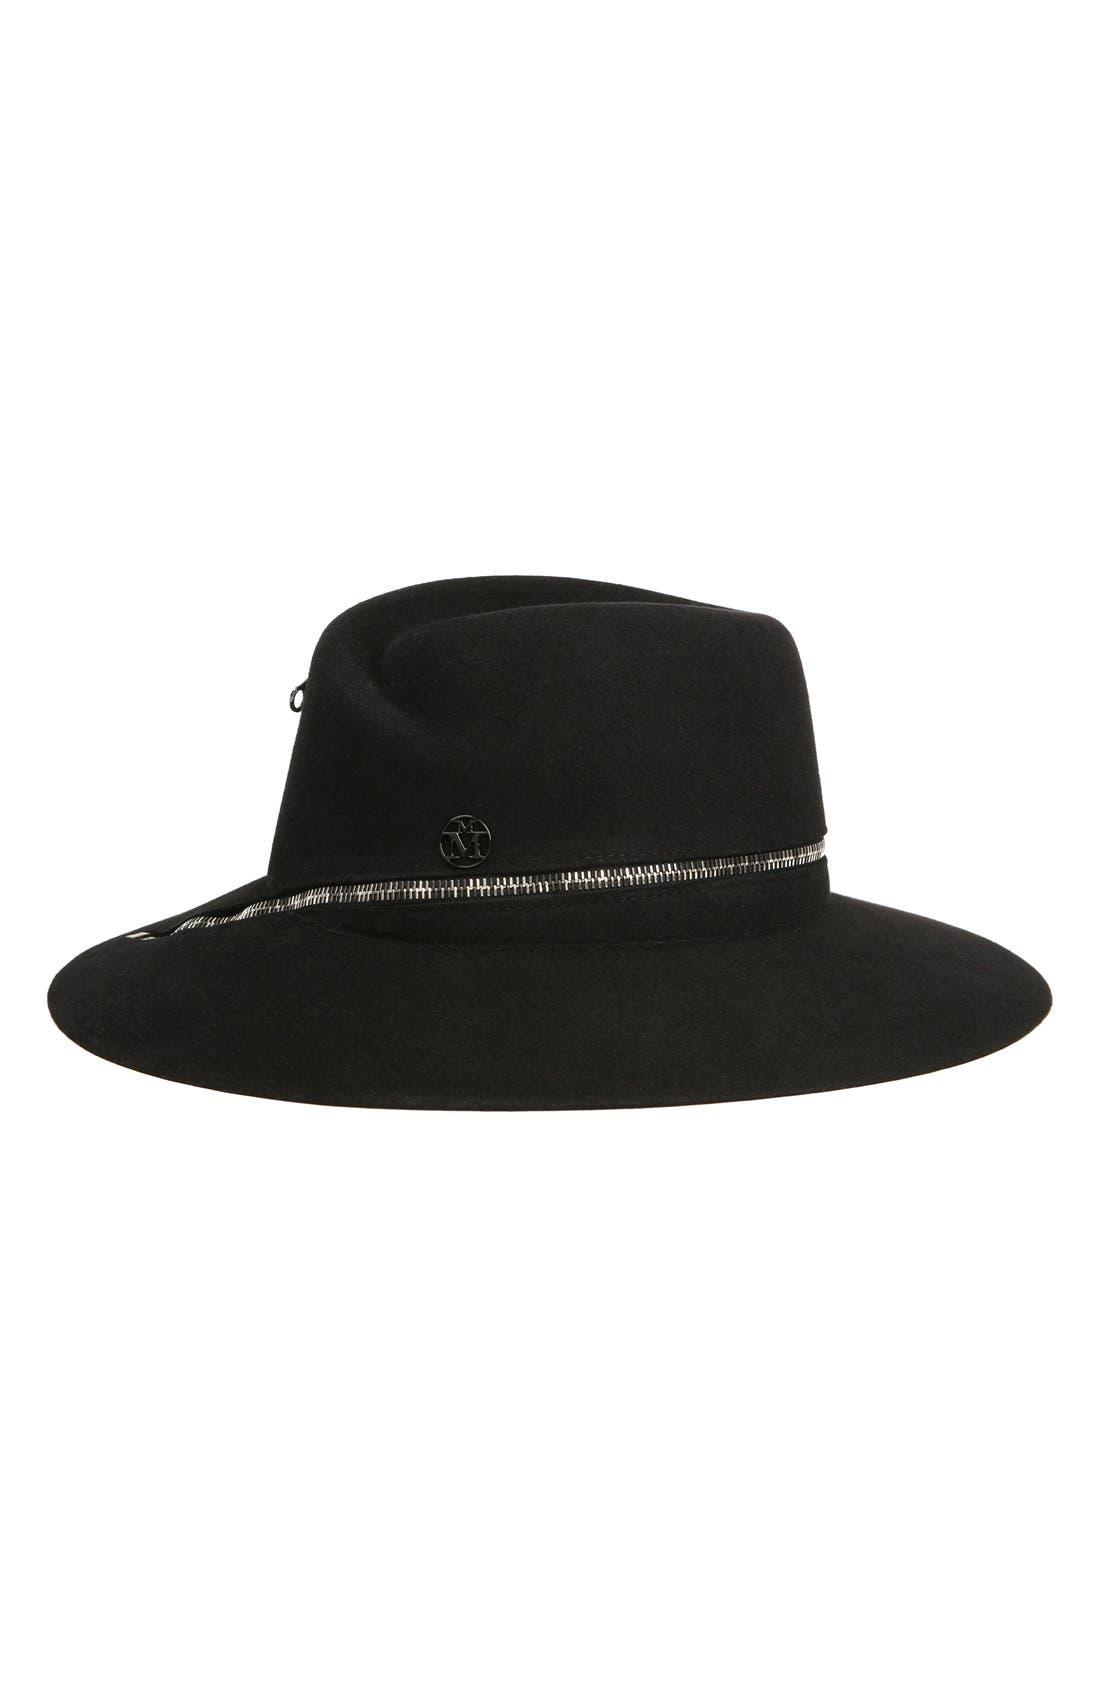 Alternate Image 1 Selected - Maison Michel Virginie Fur Felt Hat